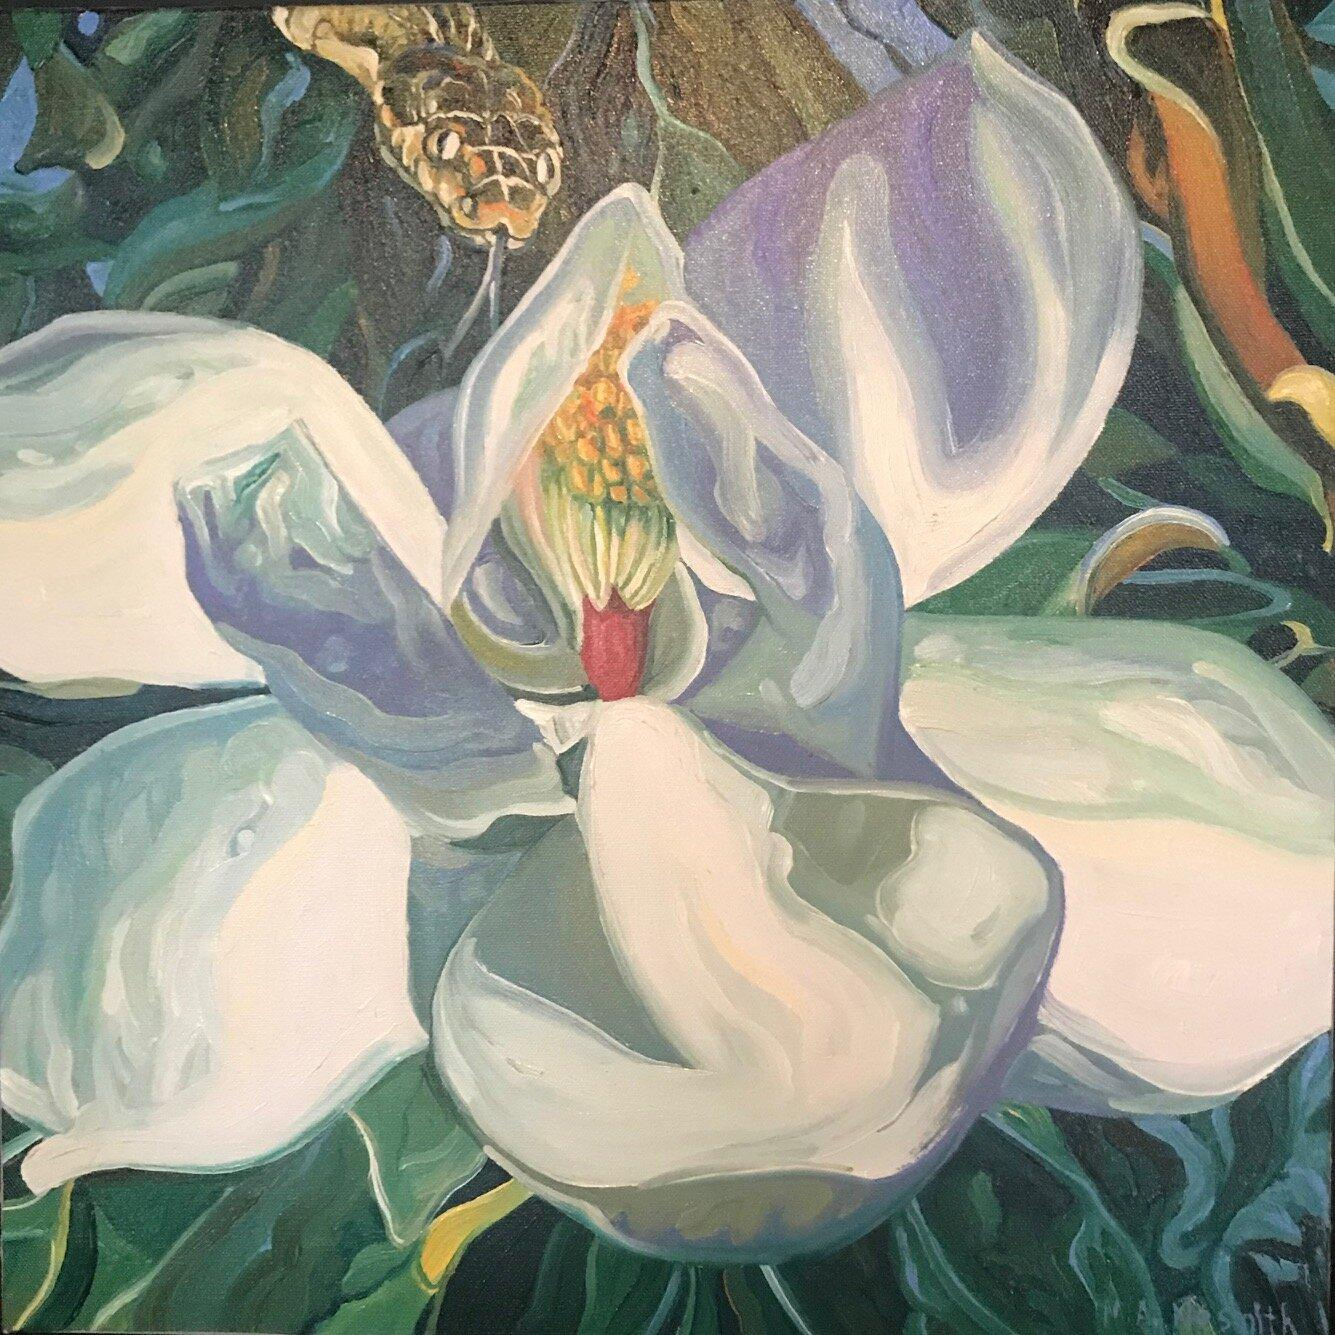 The Garden of Good & Evil, Texan Artist, Oil, Wildlife personifying Human Traits